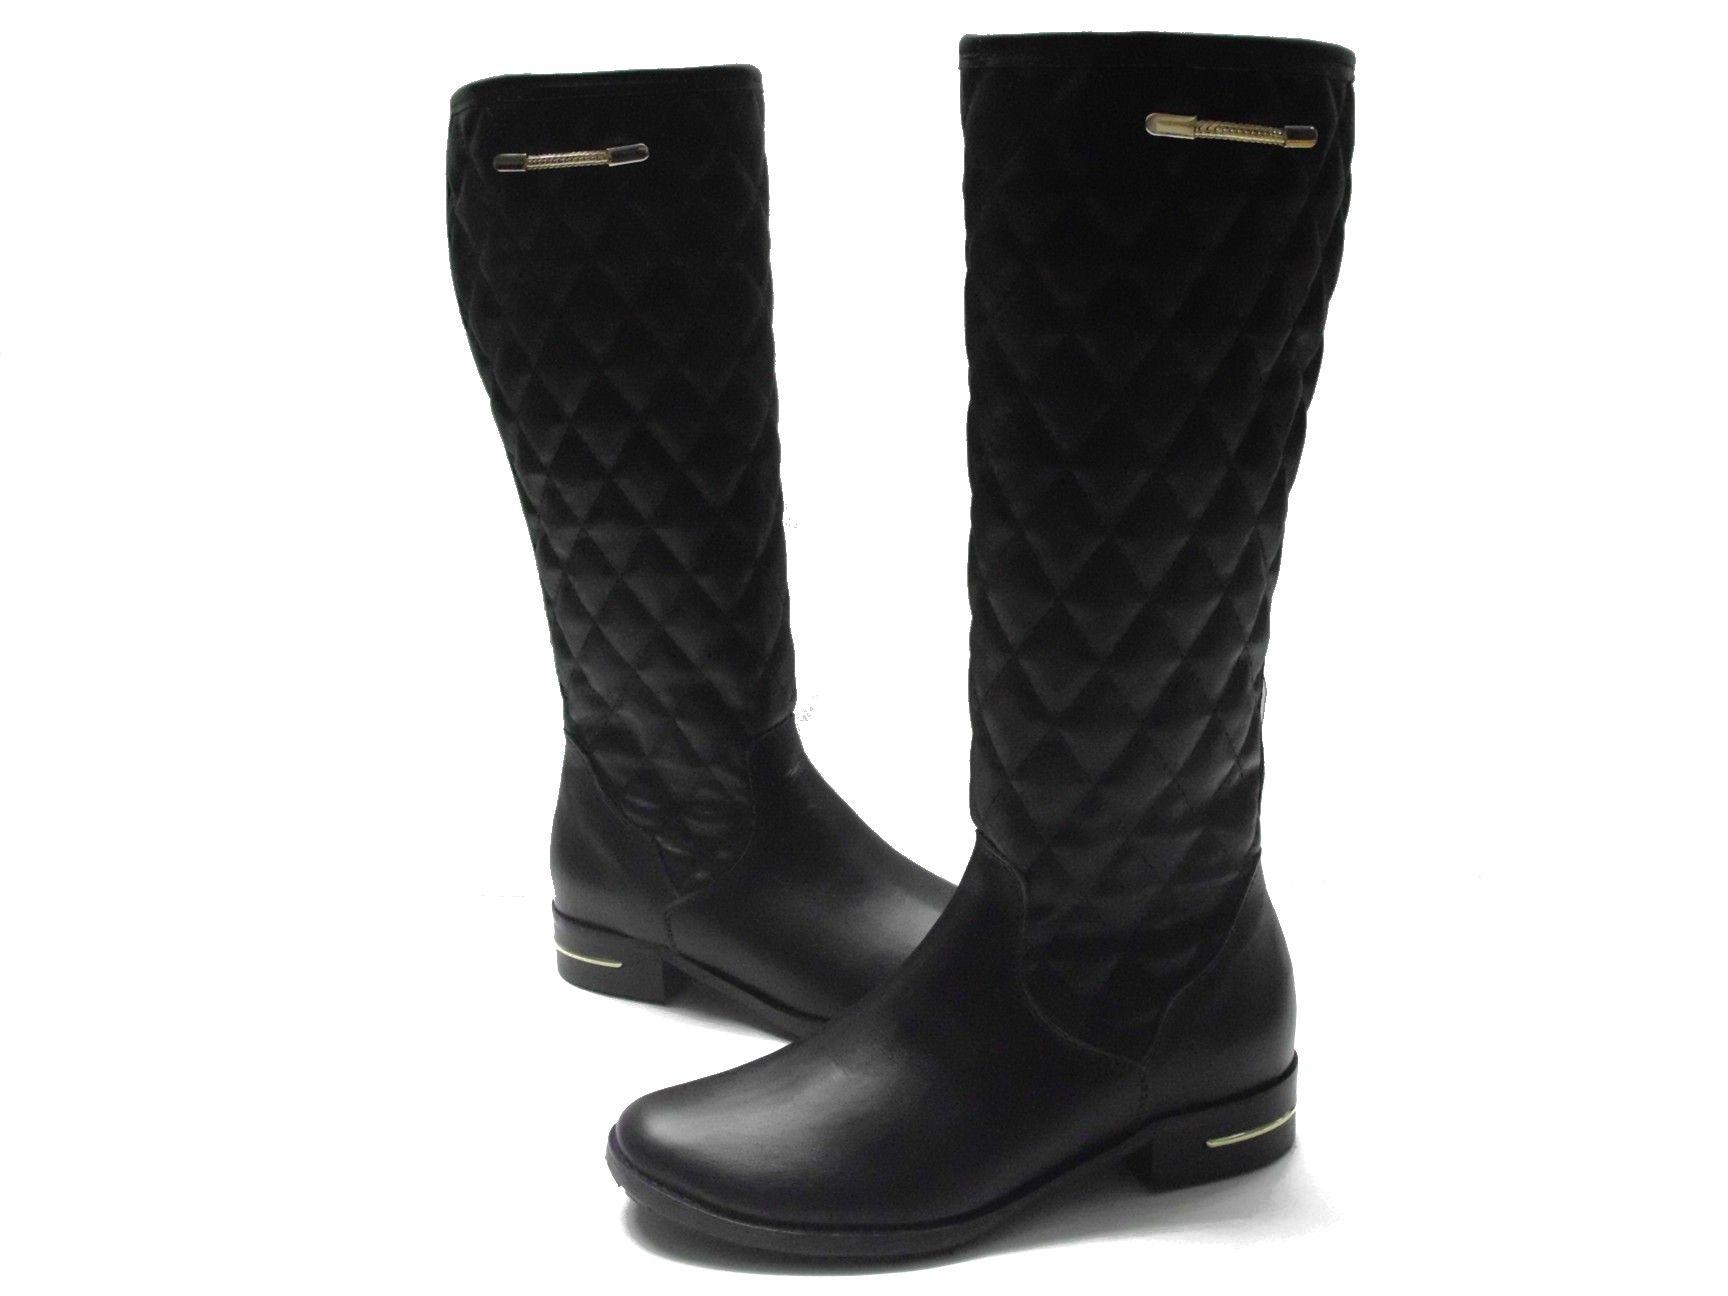 Kozaki Zimowe Czarne Skora Naturalna Wzor Pikowany Zlote Wstawki Boots Riding Boots Rubber Rain Boots